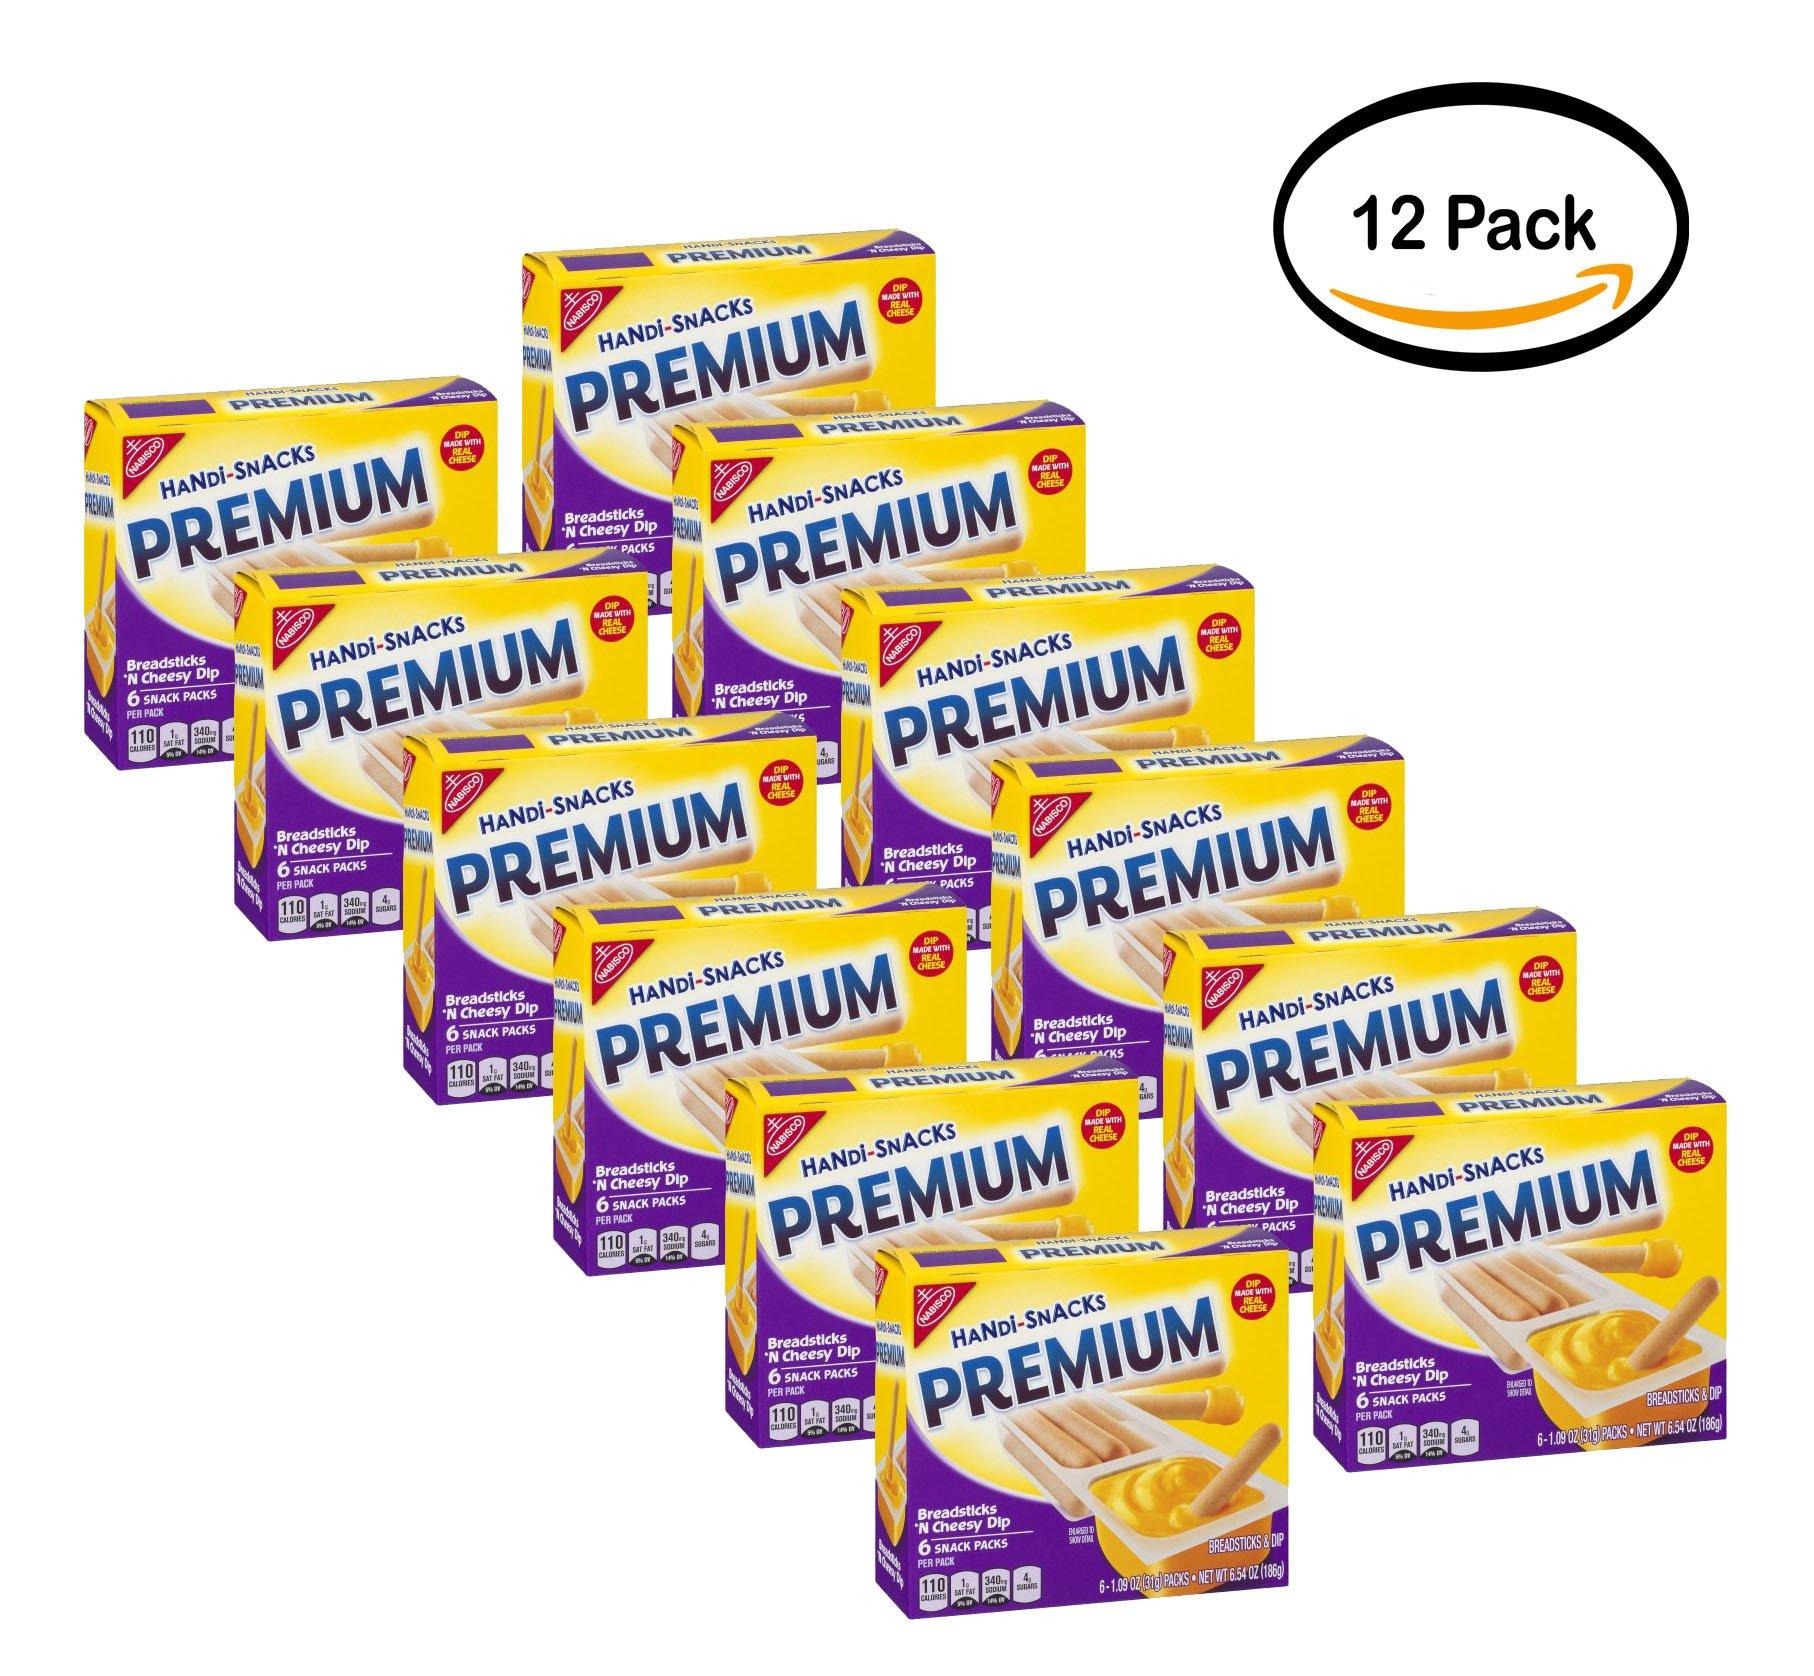 PACK OF 12 - Nabisco Handi-Snacks Premium Snack Packs Breadsticks 'N Cheesy Dip - 6 CT